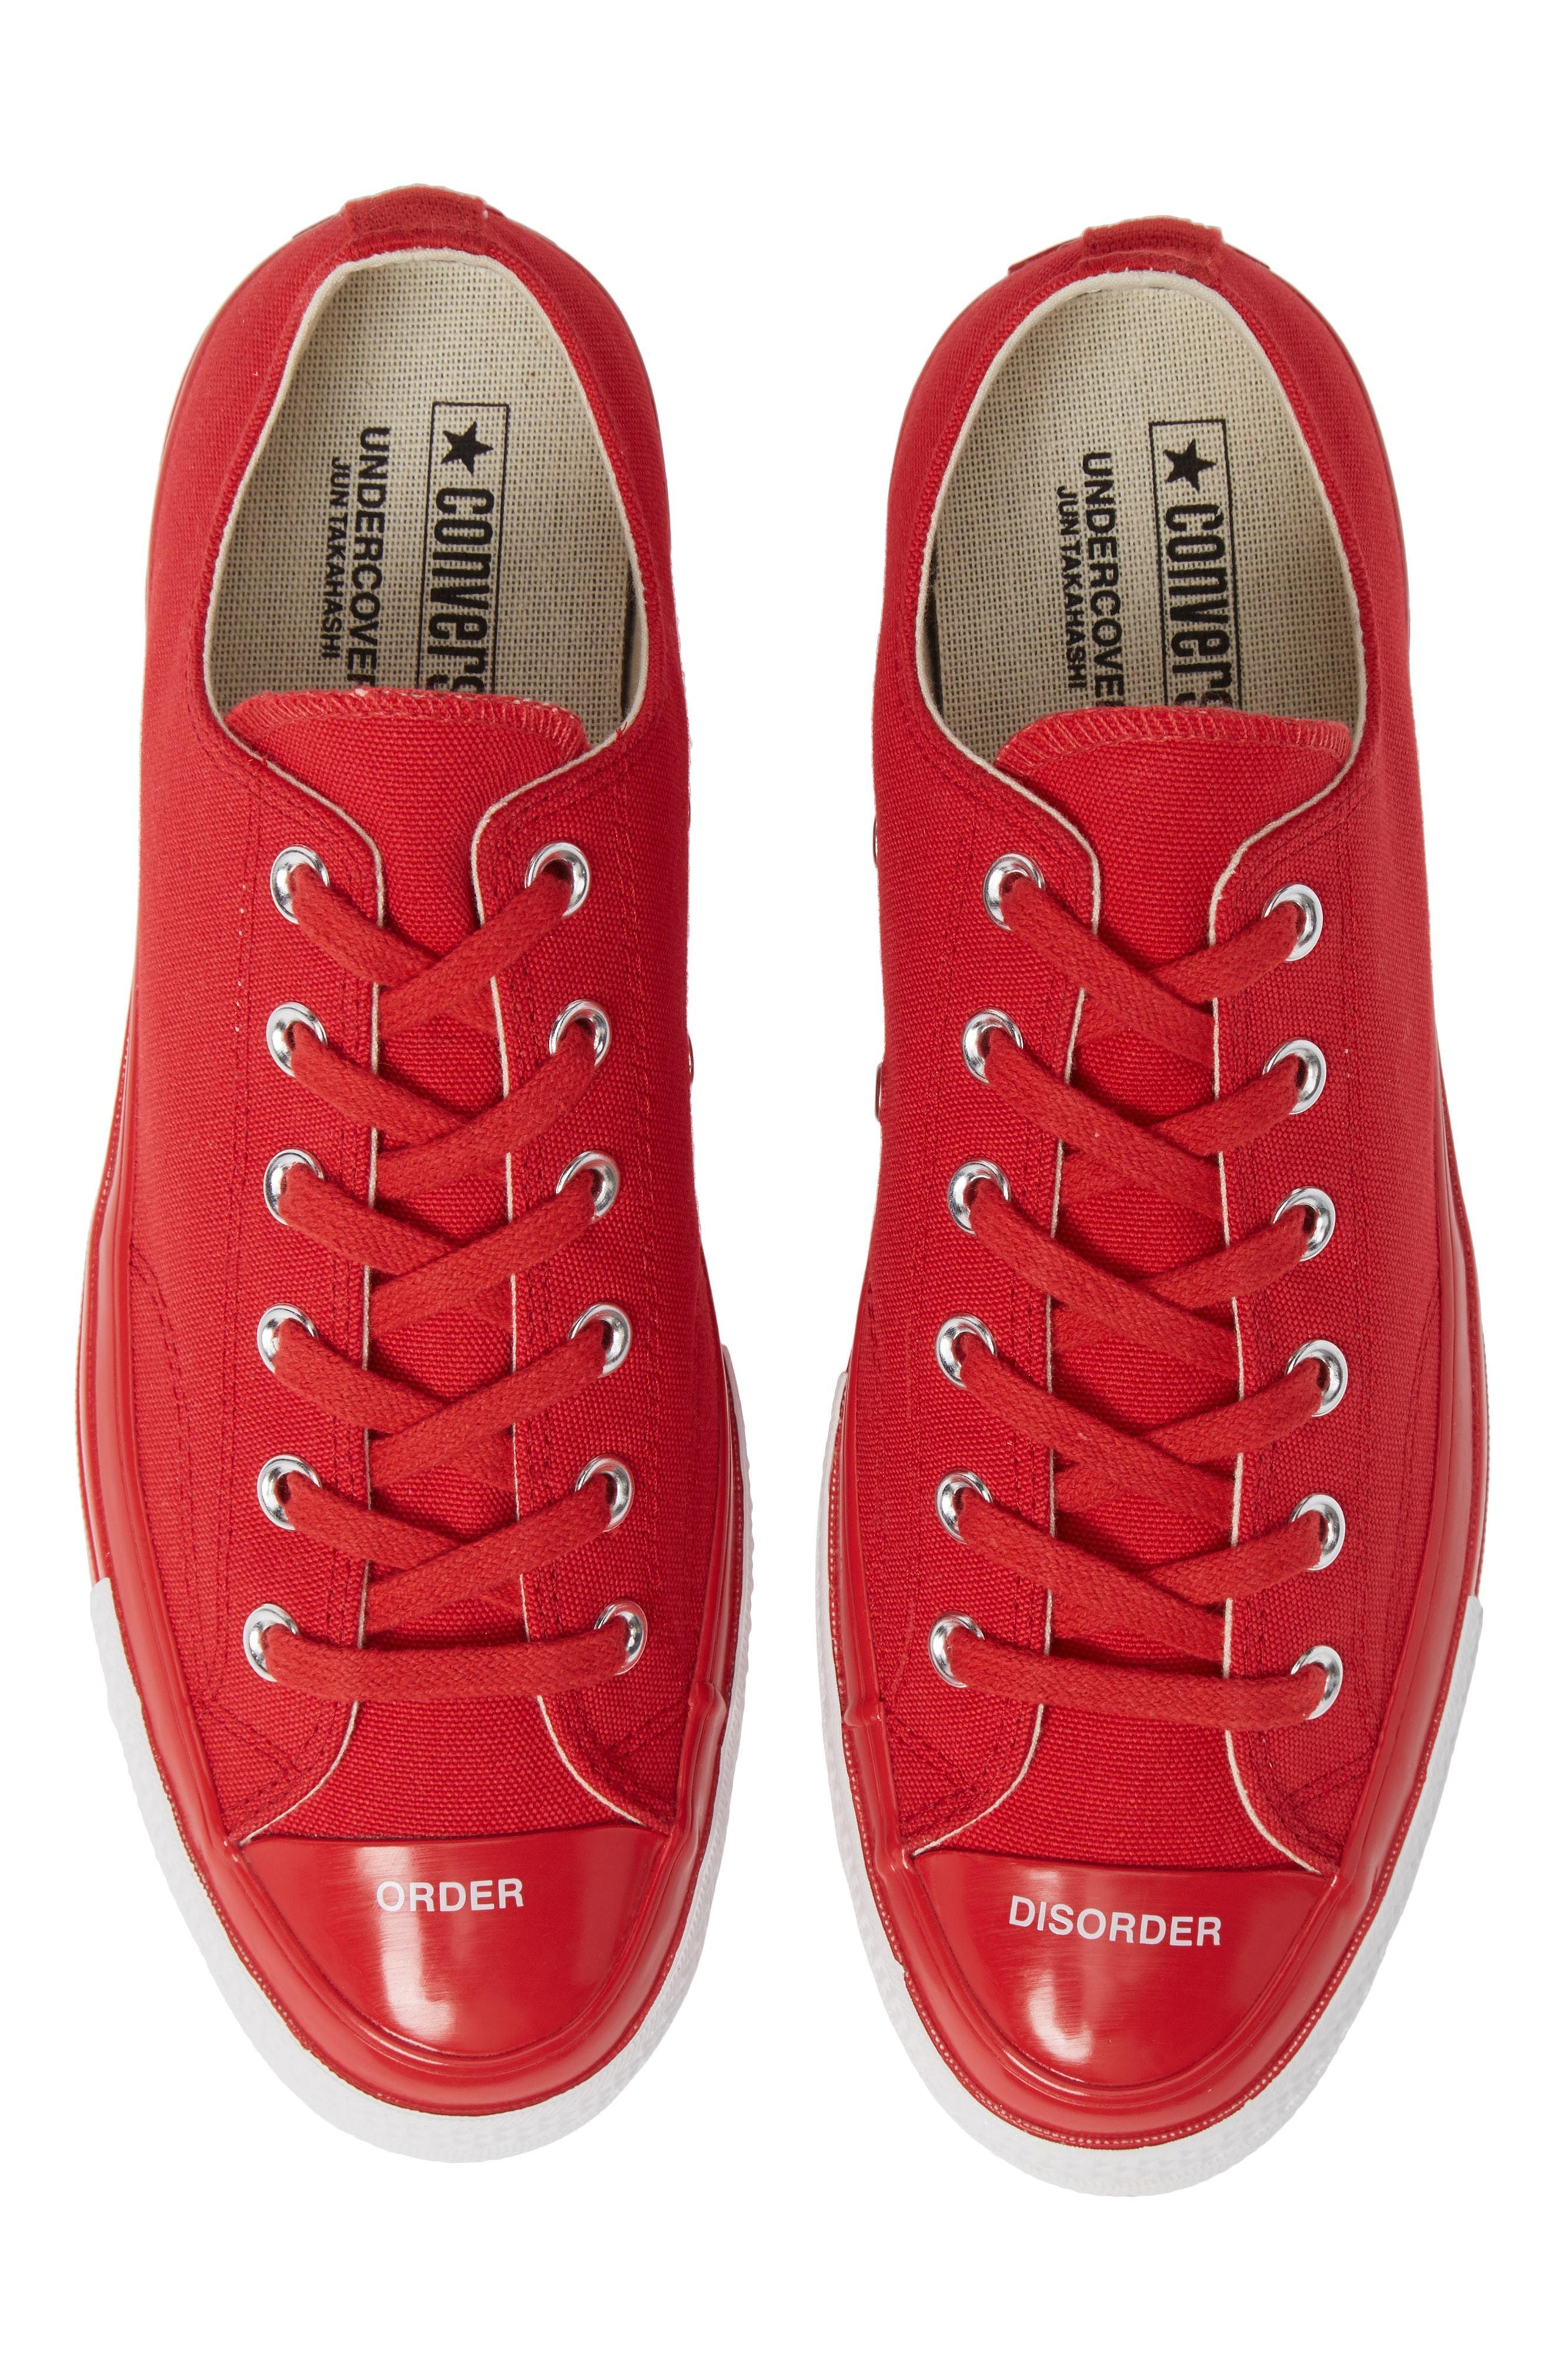 449d61d4a09 ... Low Top Sneakers Converse X Undercover Chuck 70 Sneaker